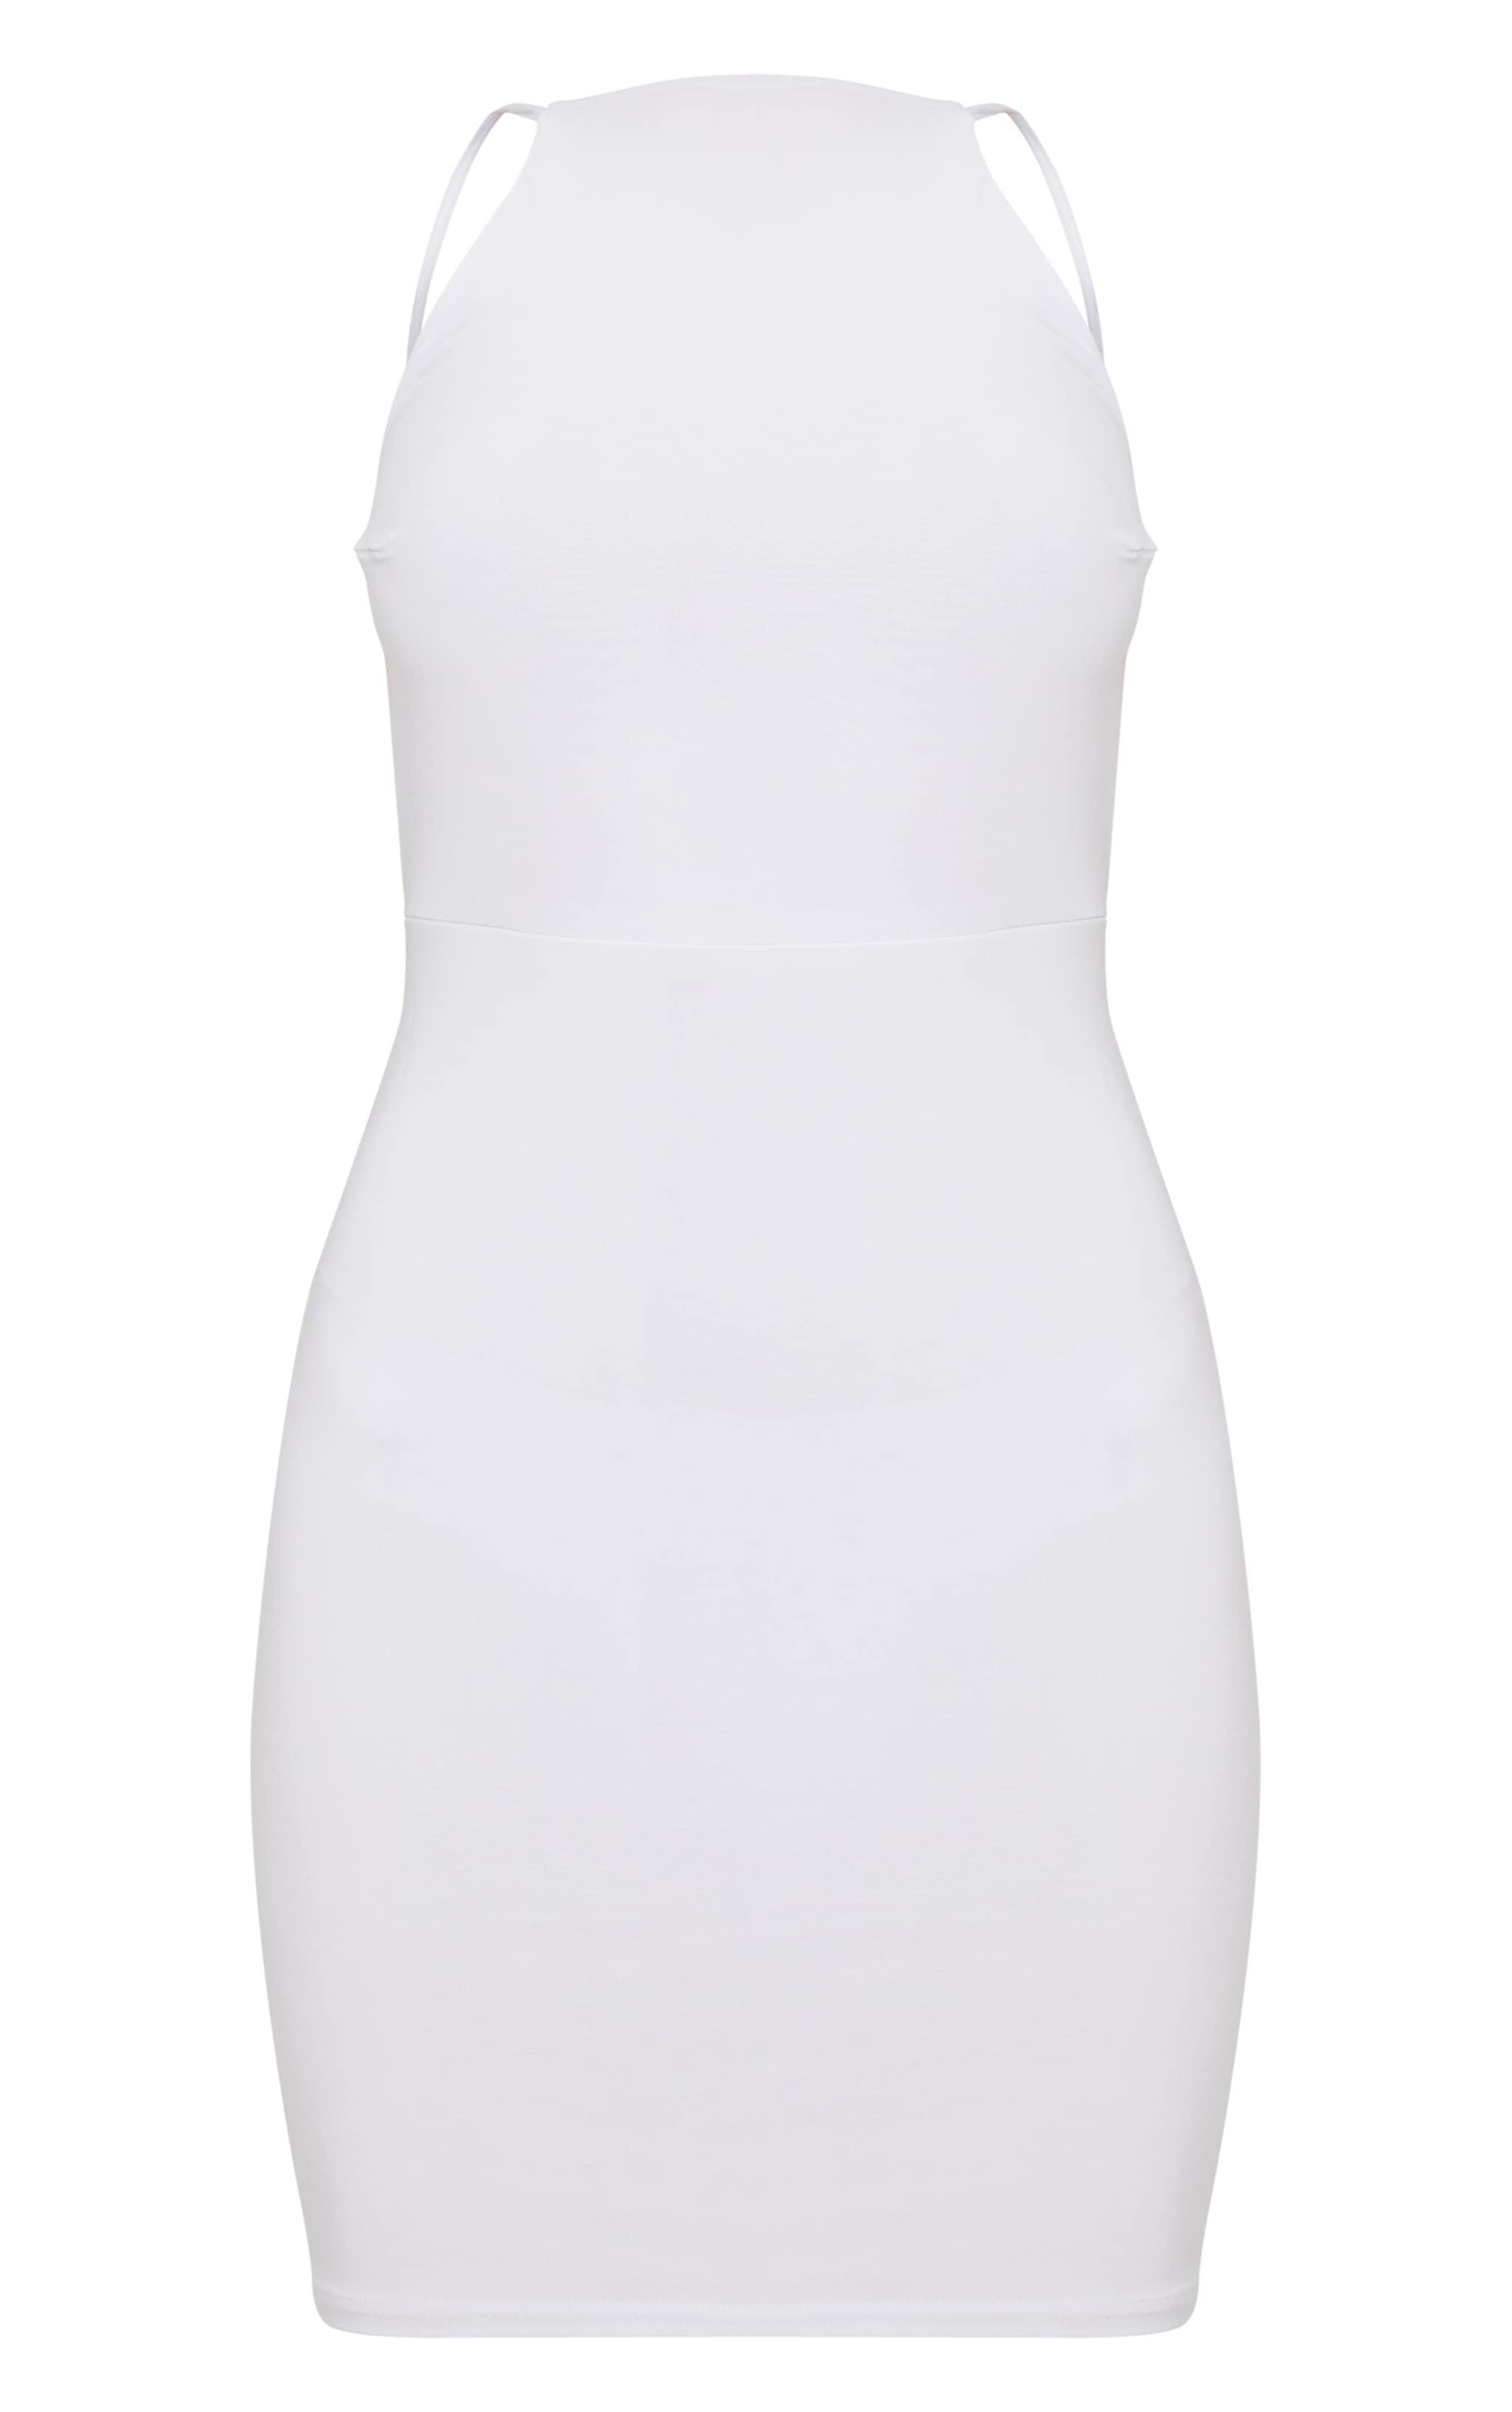 White Double Layer Slinky Halterneck Twist Low Back Detail Bodycon Dress 3